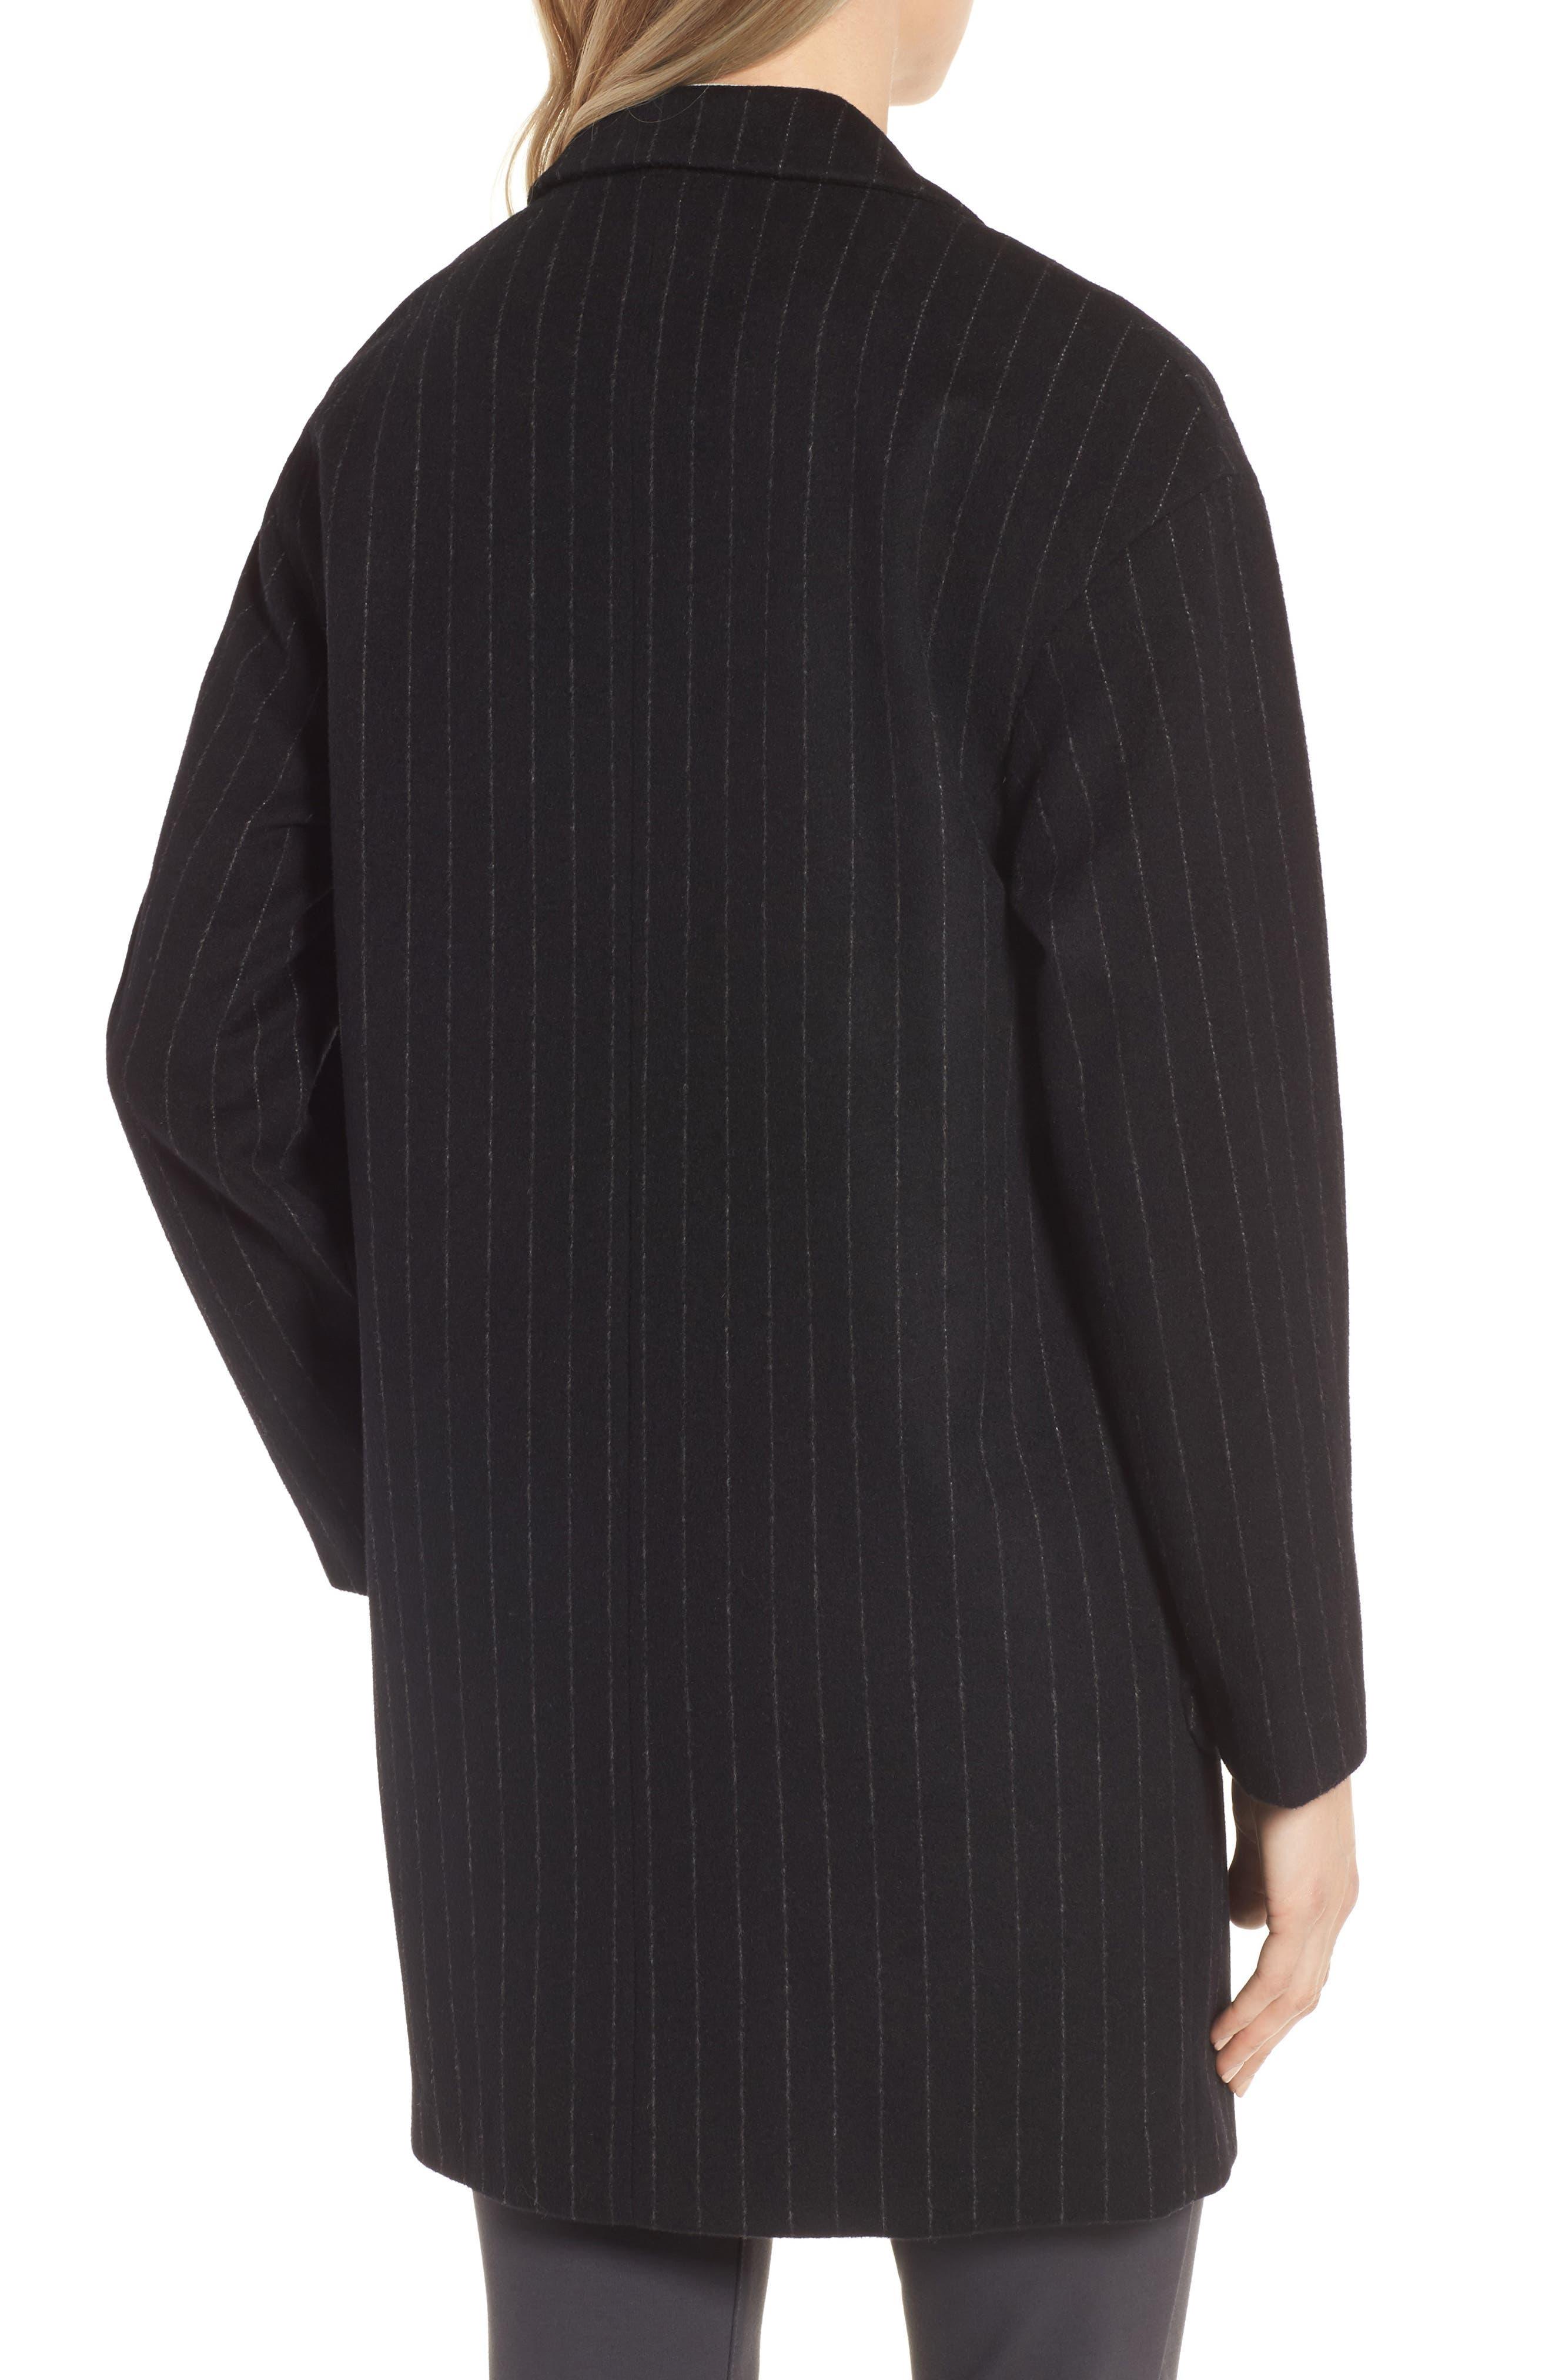 DKNY Pinstripe Wool Blend Coat,                             Alternate thumbnail 2, color,                             001